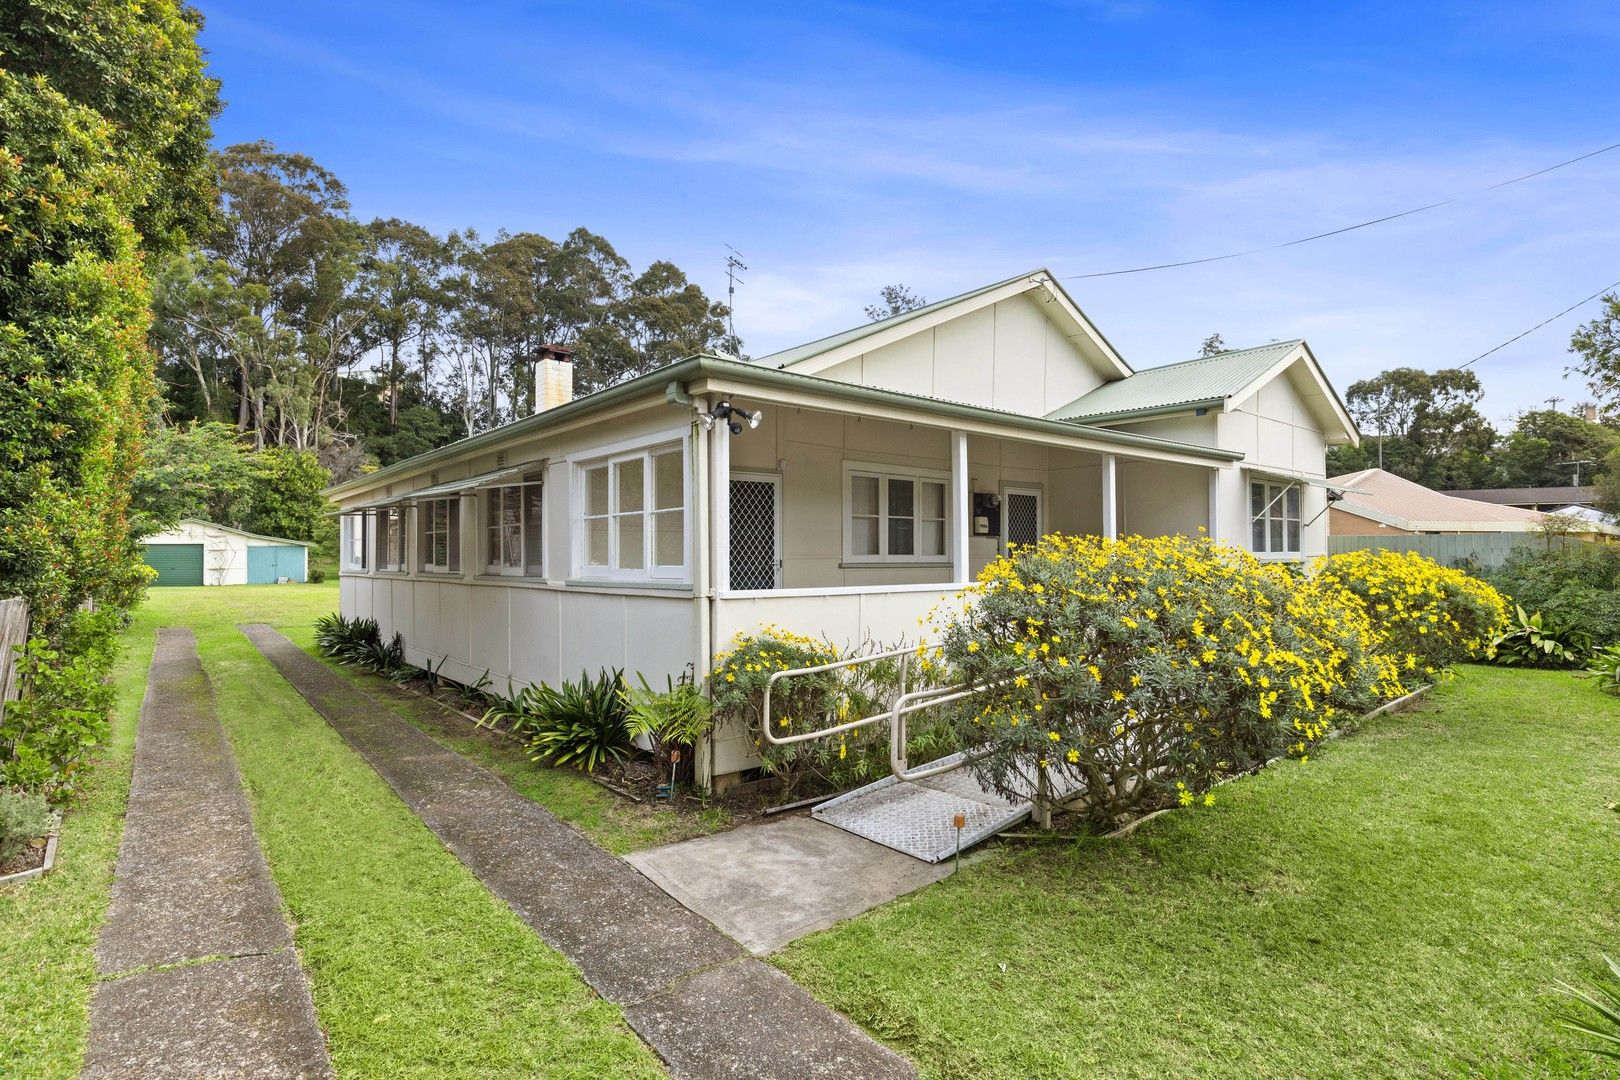 12 Herarde Street, Batemans Bay NSW 2536, Image 0